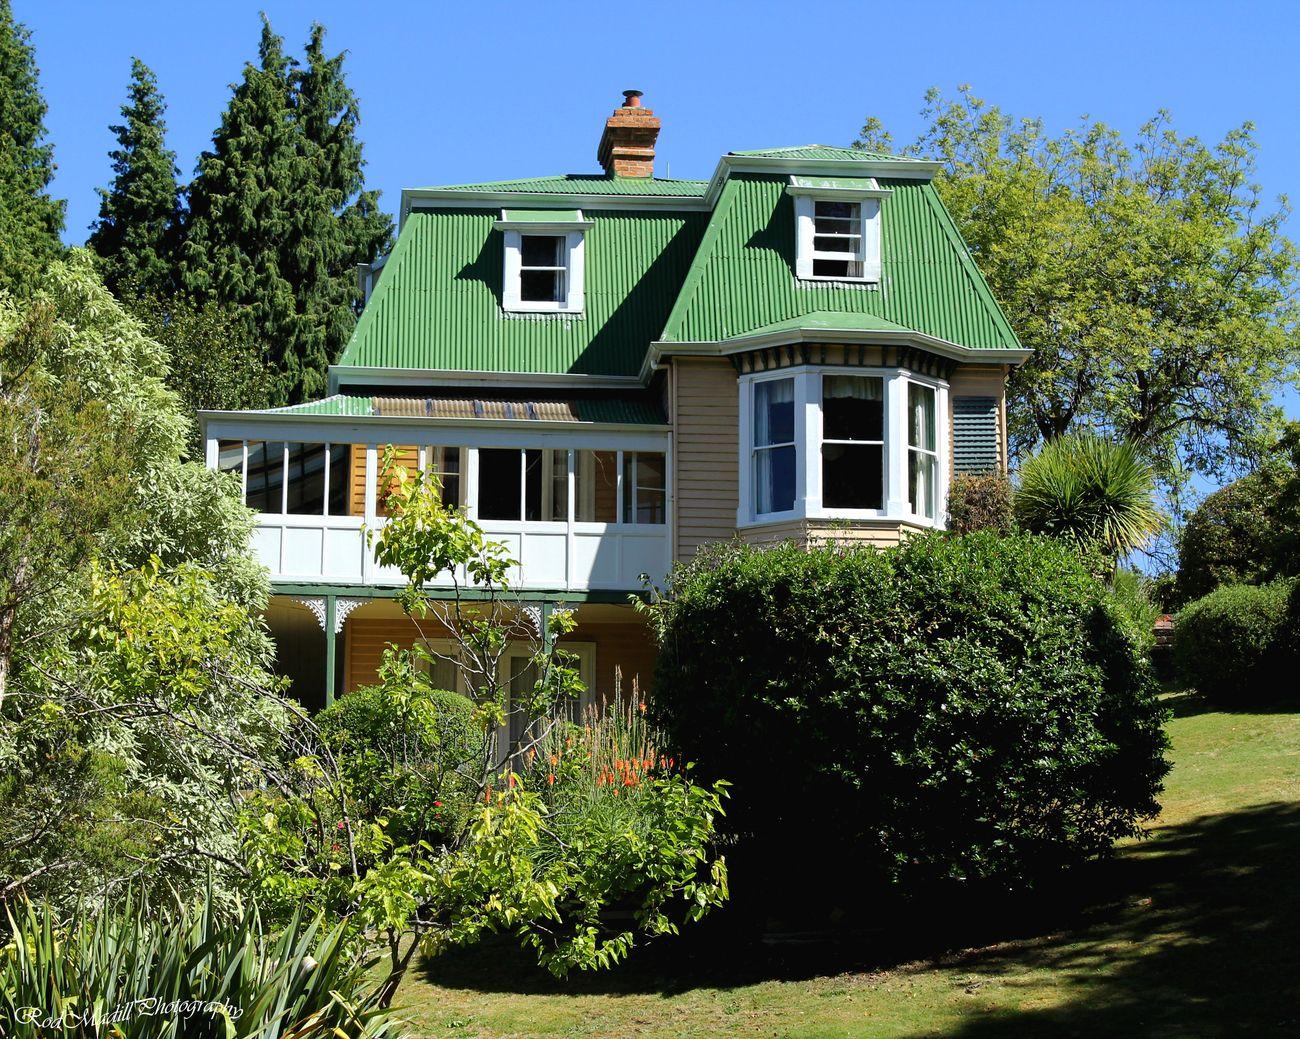 house in Tassie